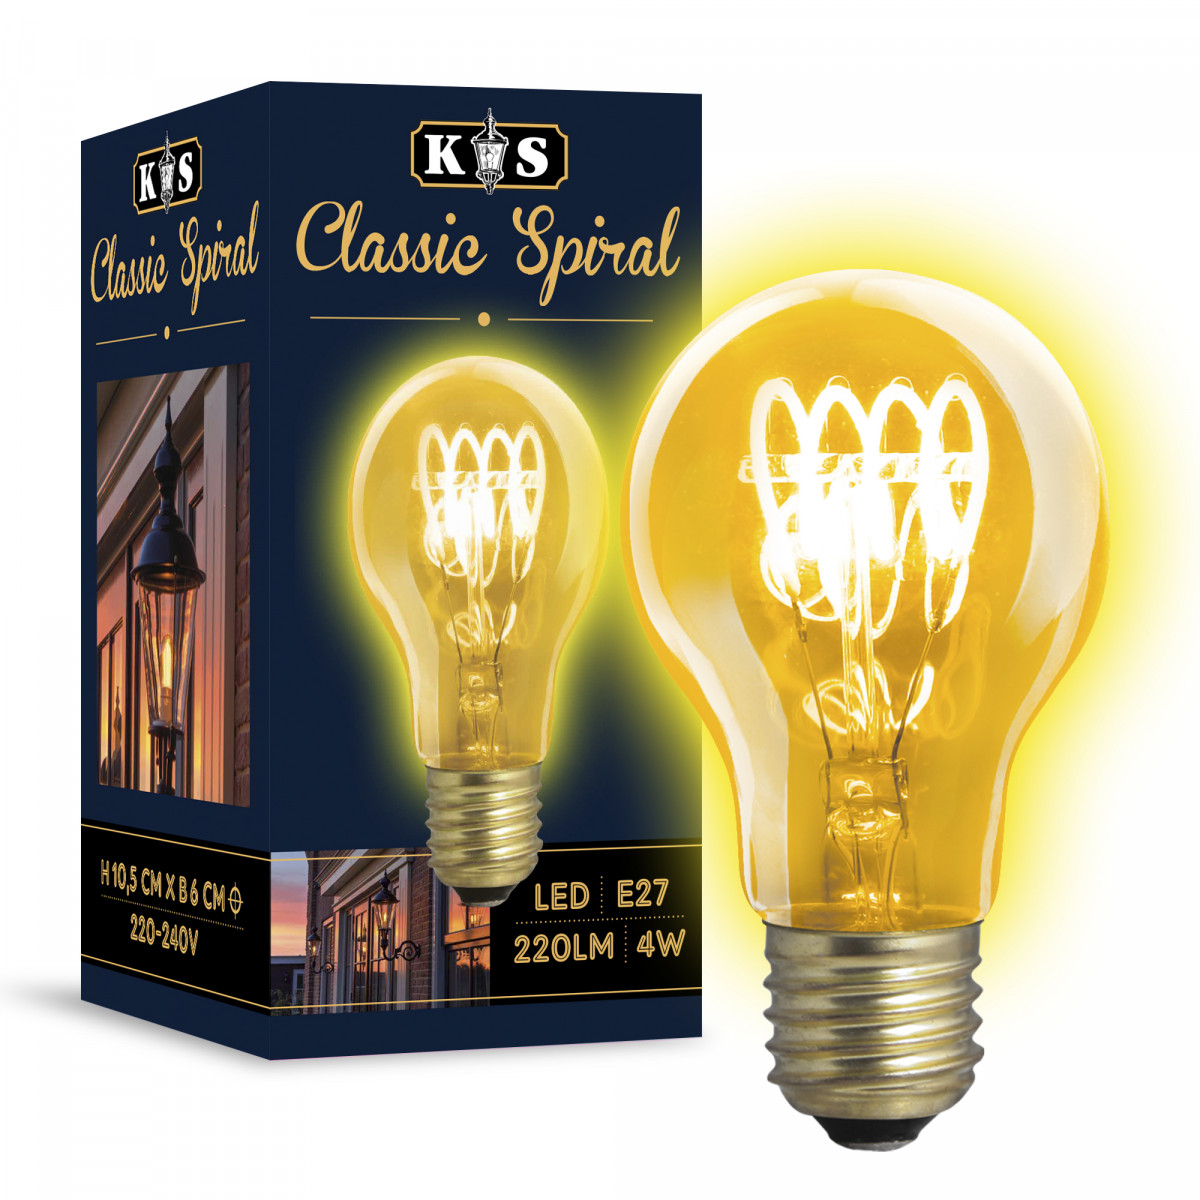 Ledlamp KS Classic Spiral - 4 Watt - 220 Lumen